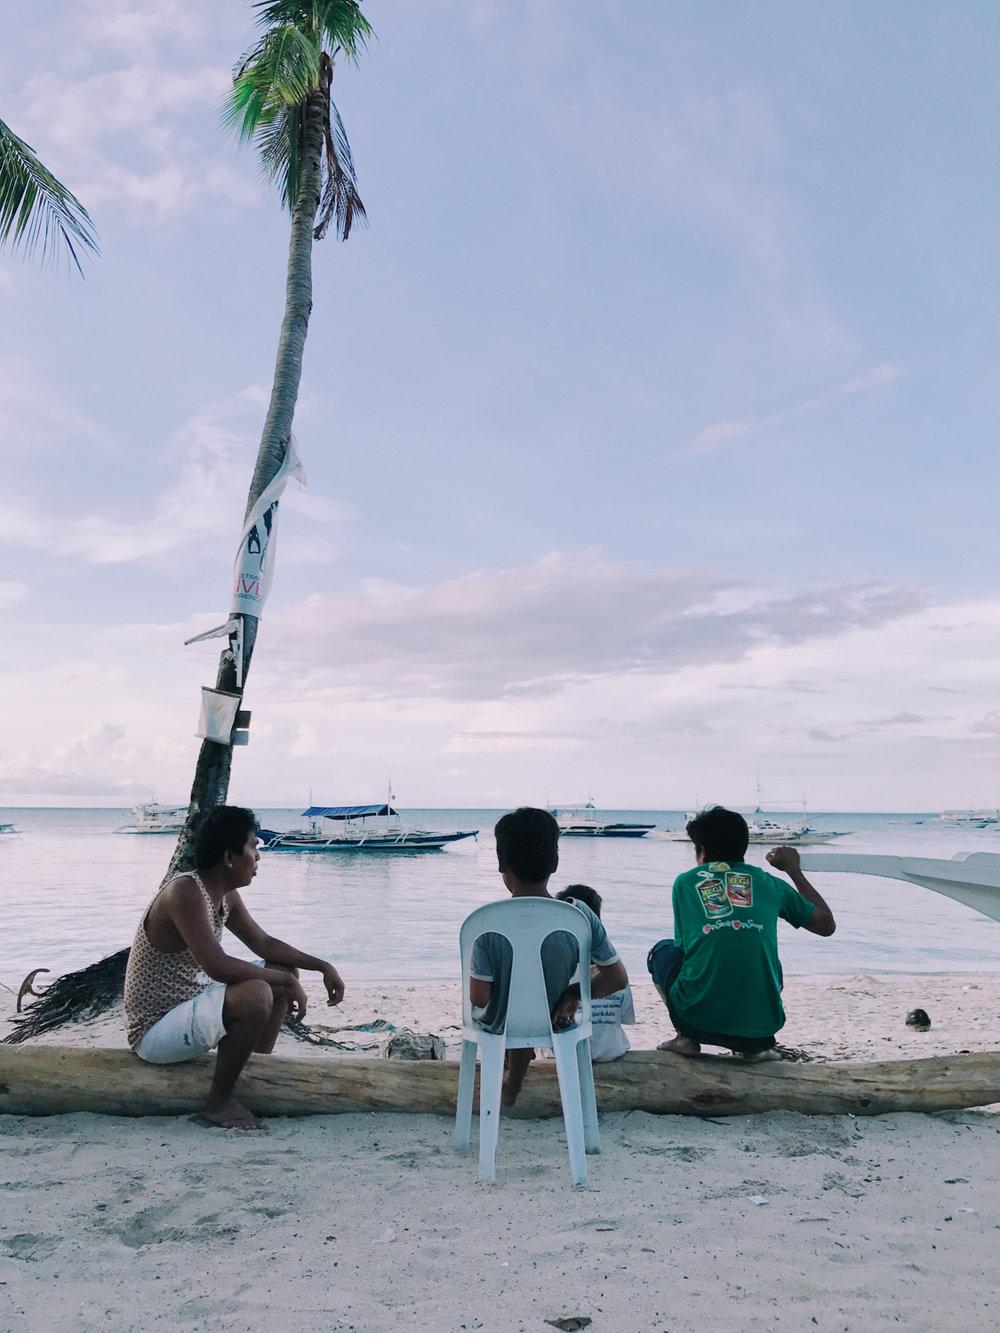 marina_philippines_malapascua19.jpg